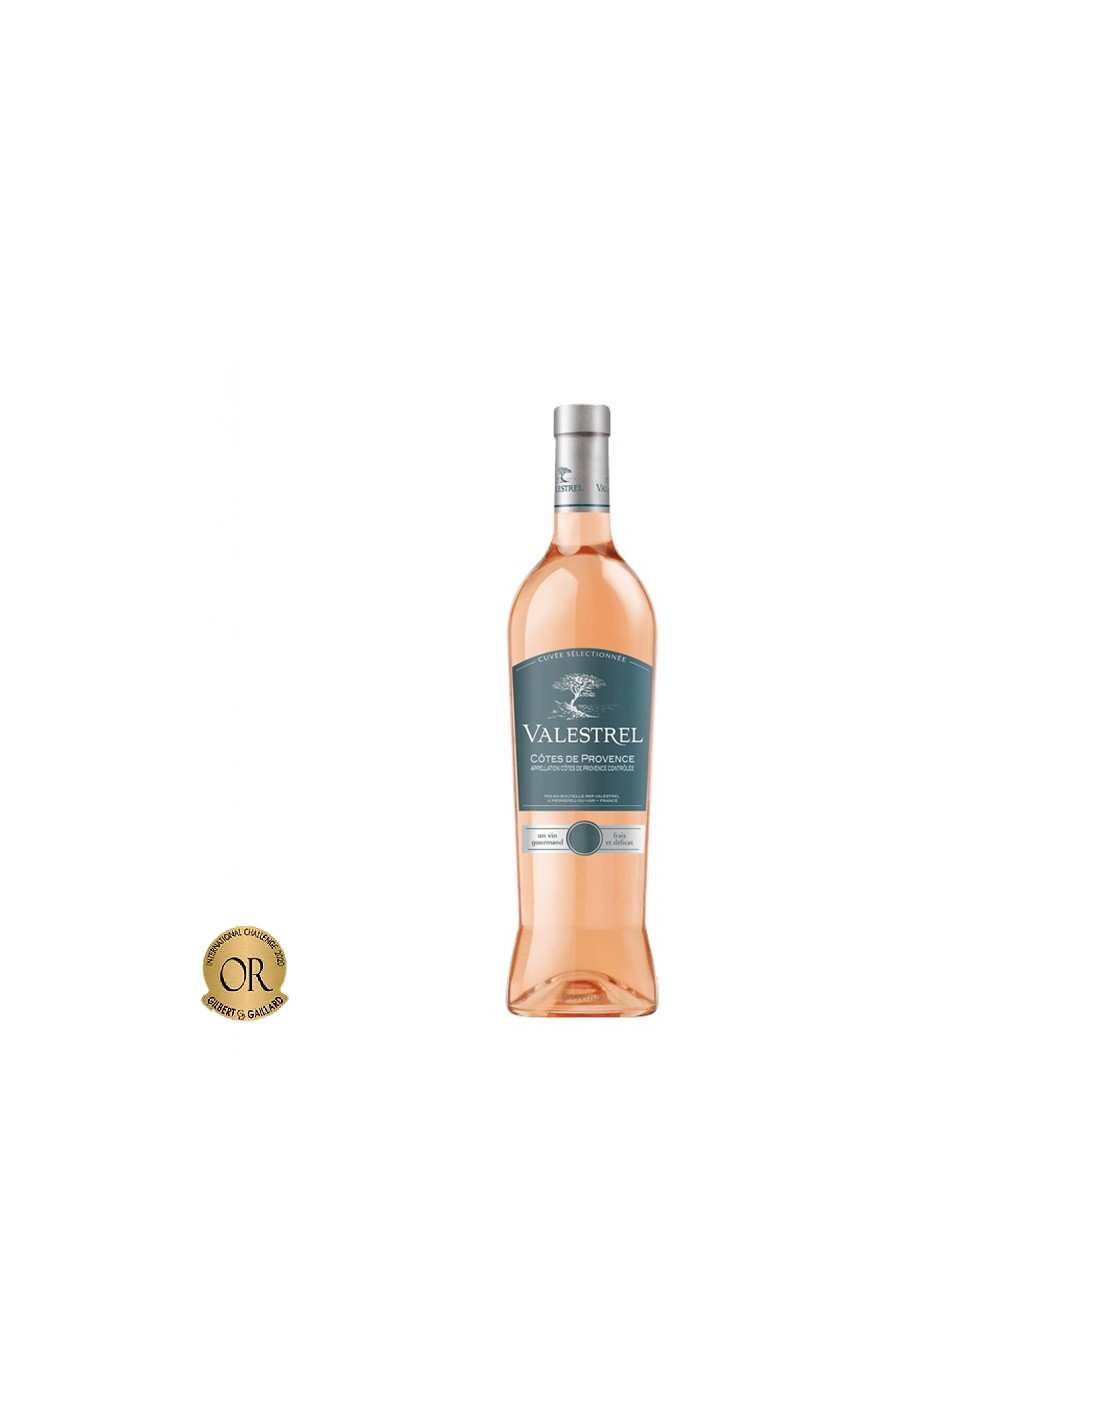 Vin roze, Jean Valestrel Côtes de Provence, 0.75L, Franta